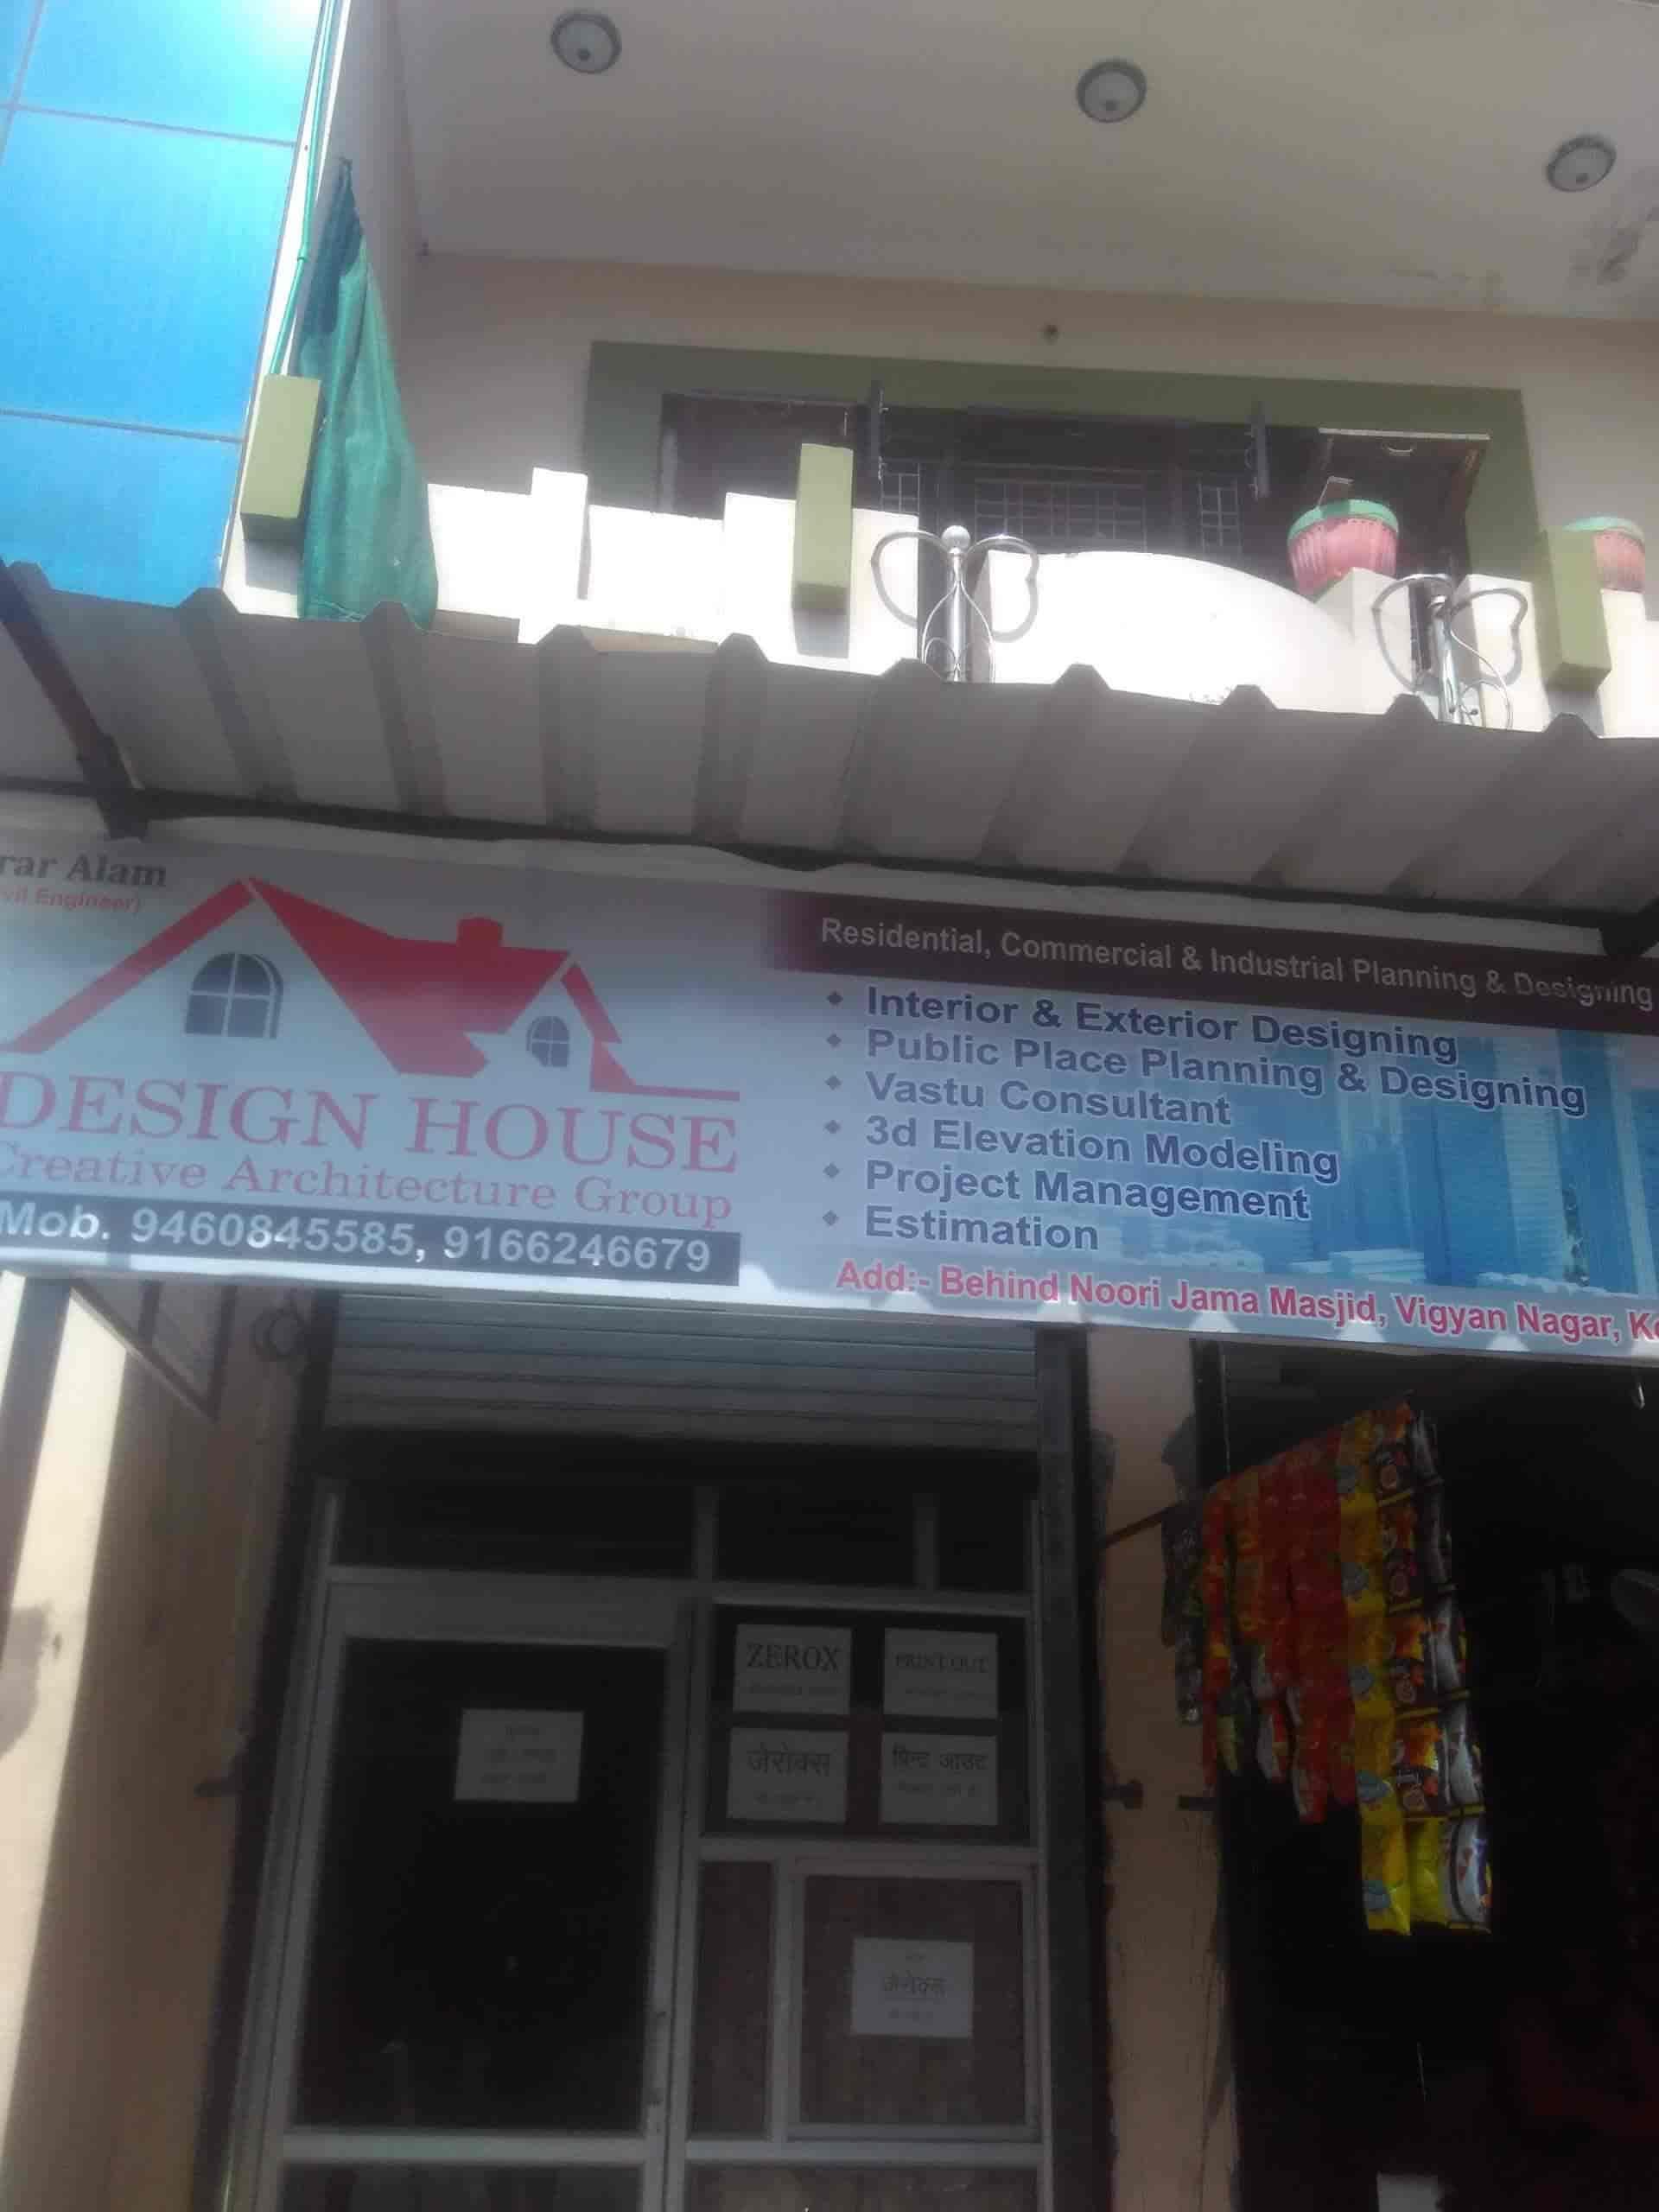 Design House Vigyan Nagar Architects In Kota Rajasthan